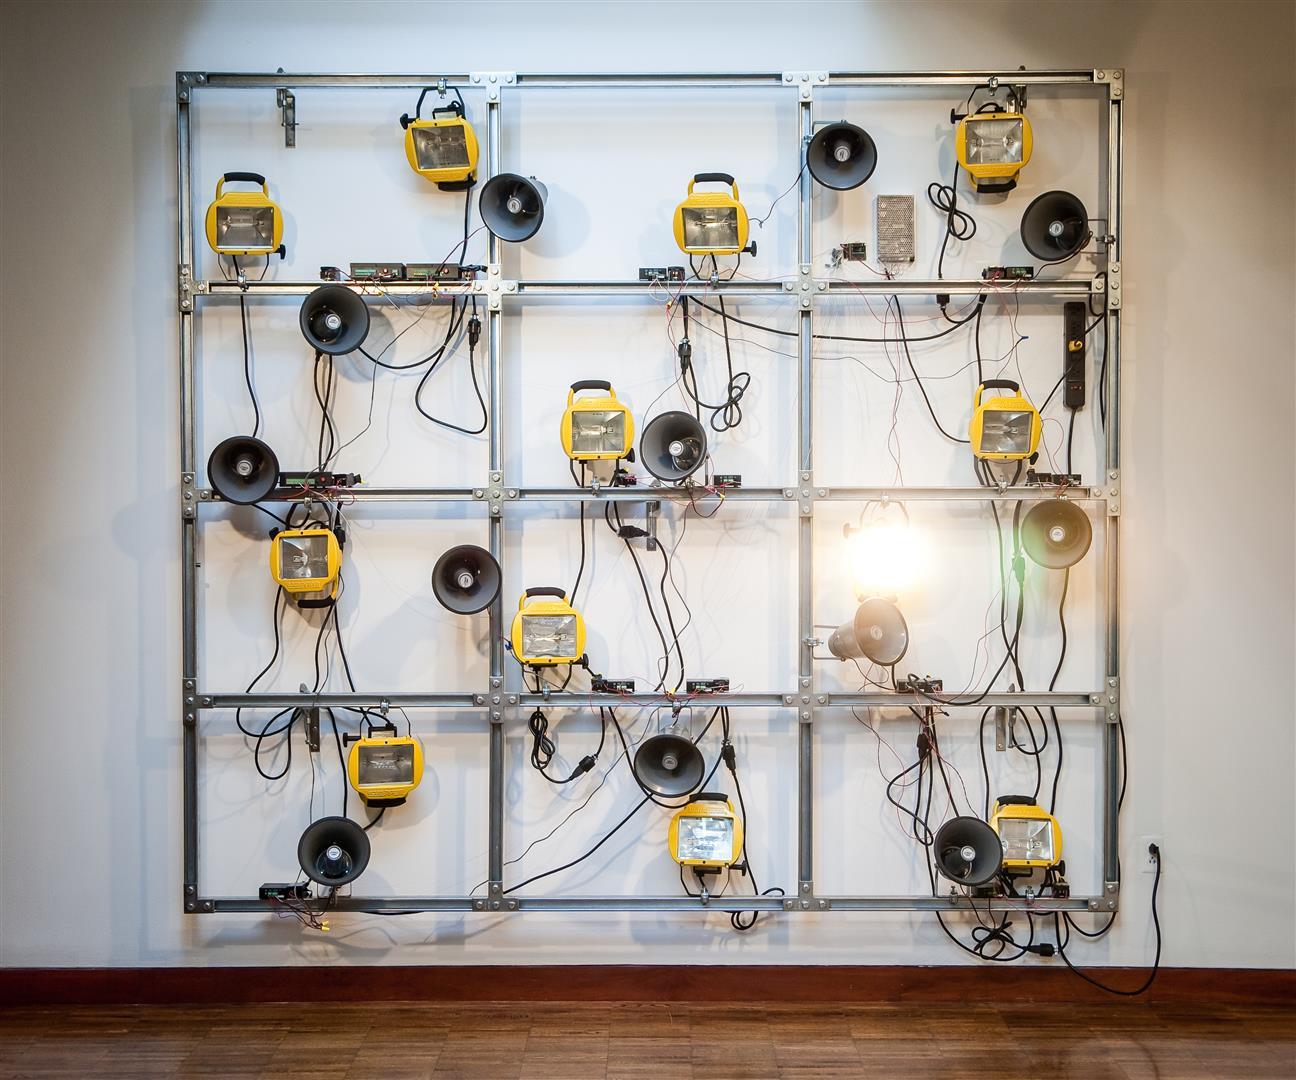 "Flashwall    Unistrut steel, electronics,media players, halogen work lights, horn loudspeakers    96½"" x 108"" x 13"" / 2012"